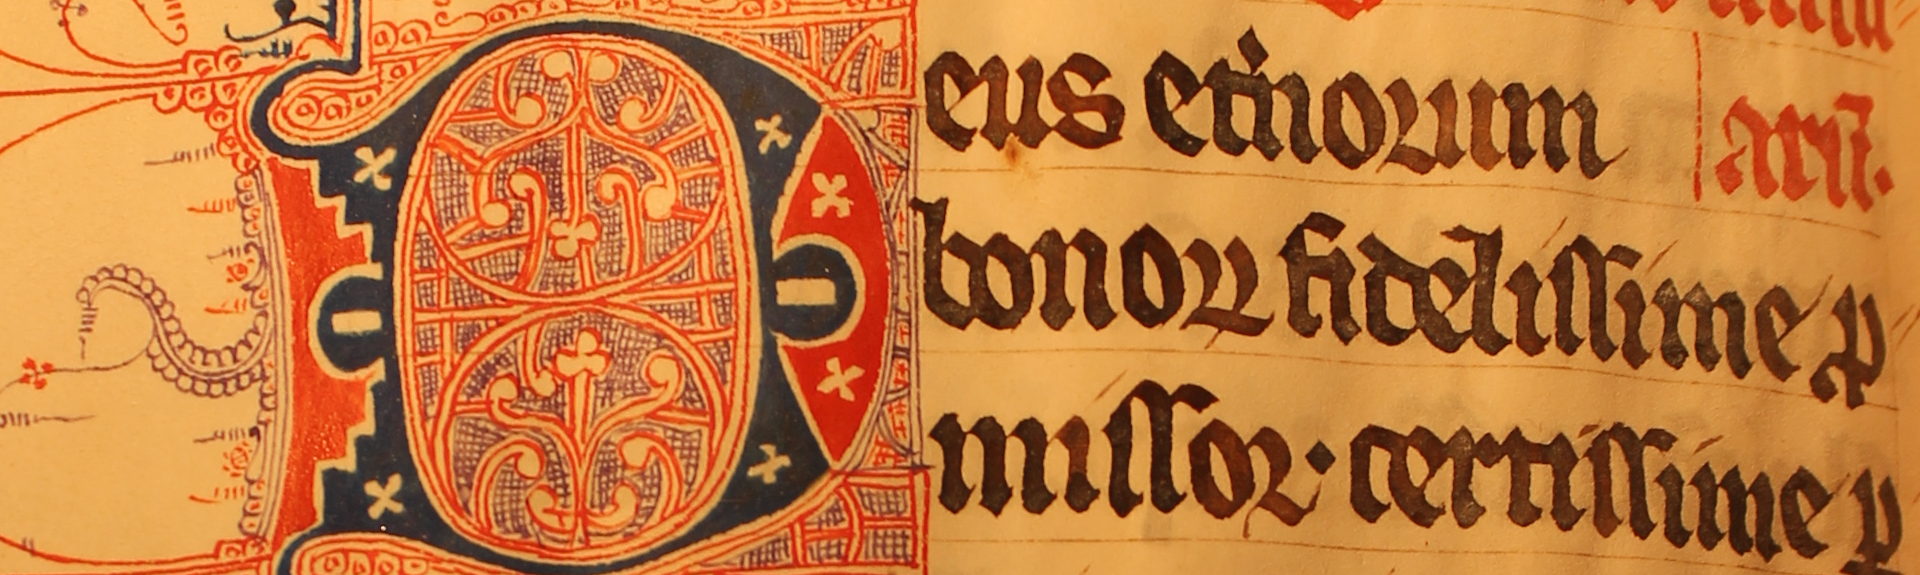 Manuscrit médiéval XIIIe siècle